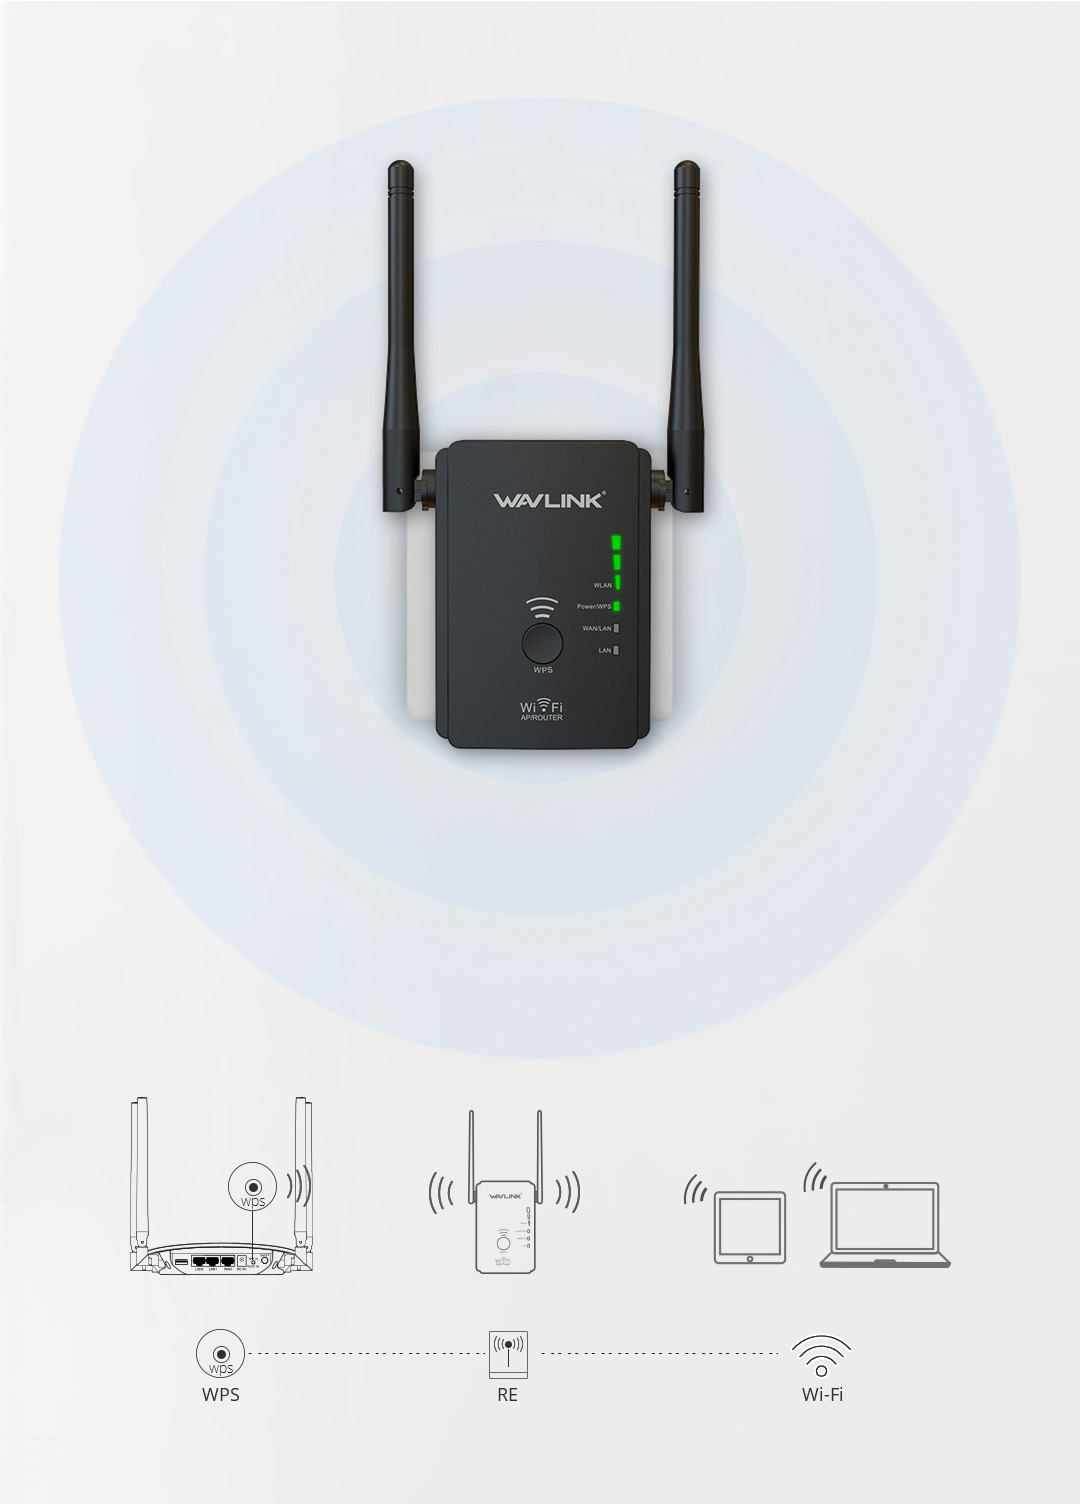 WN578R2 AERIAL S2 – N300 Wireless AP/Range Extender/Router - Wavlink